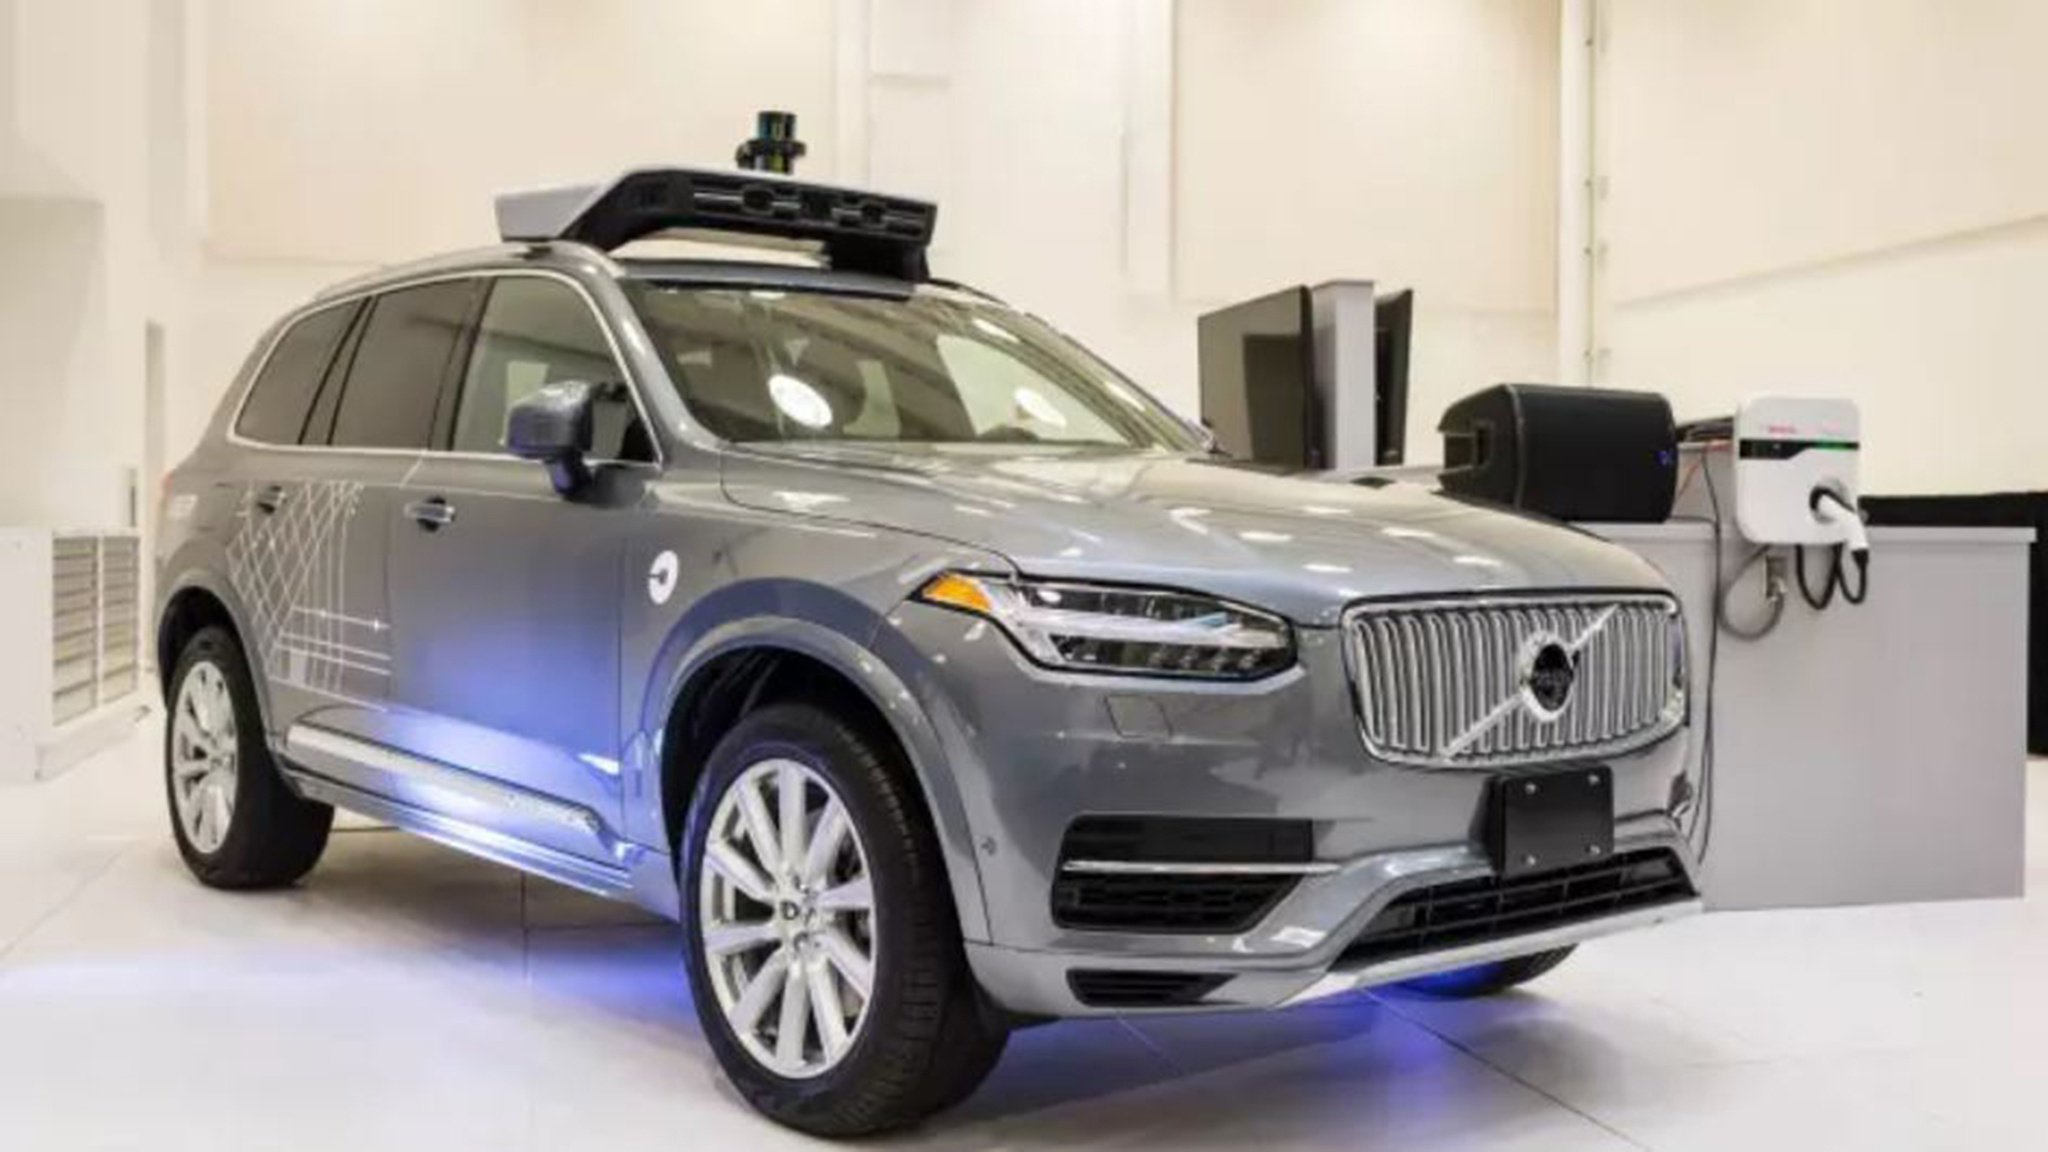 Uber to buy 24,000 Volvo cars for driverless fleet